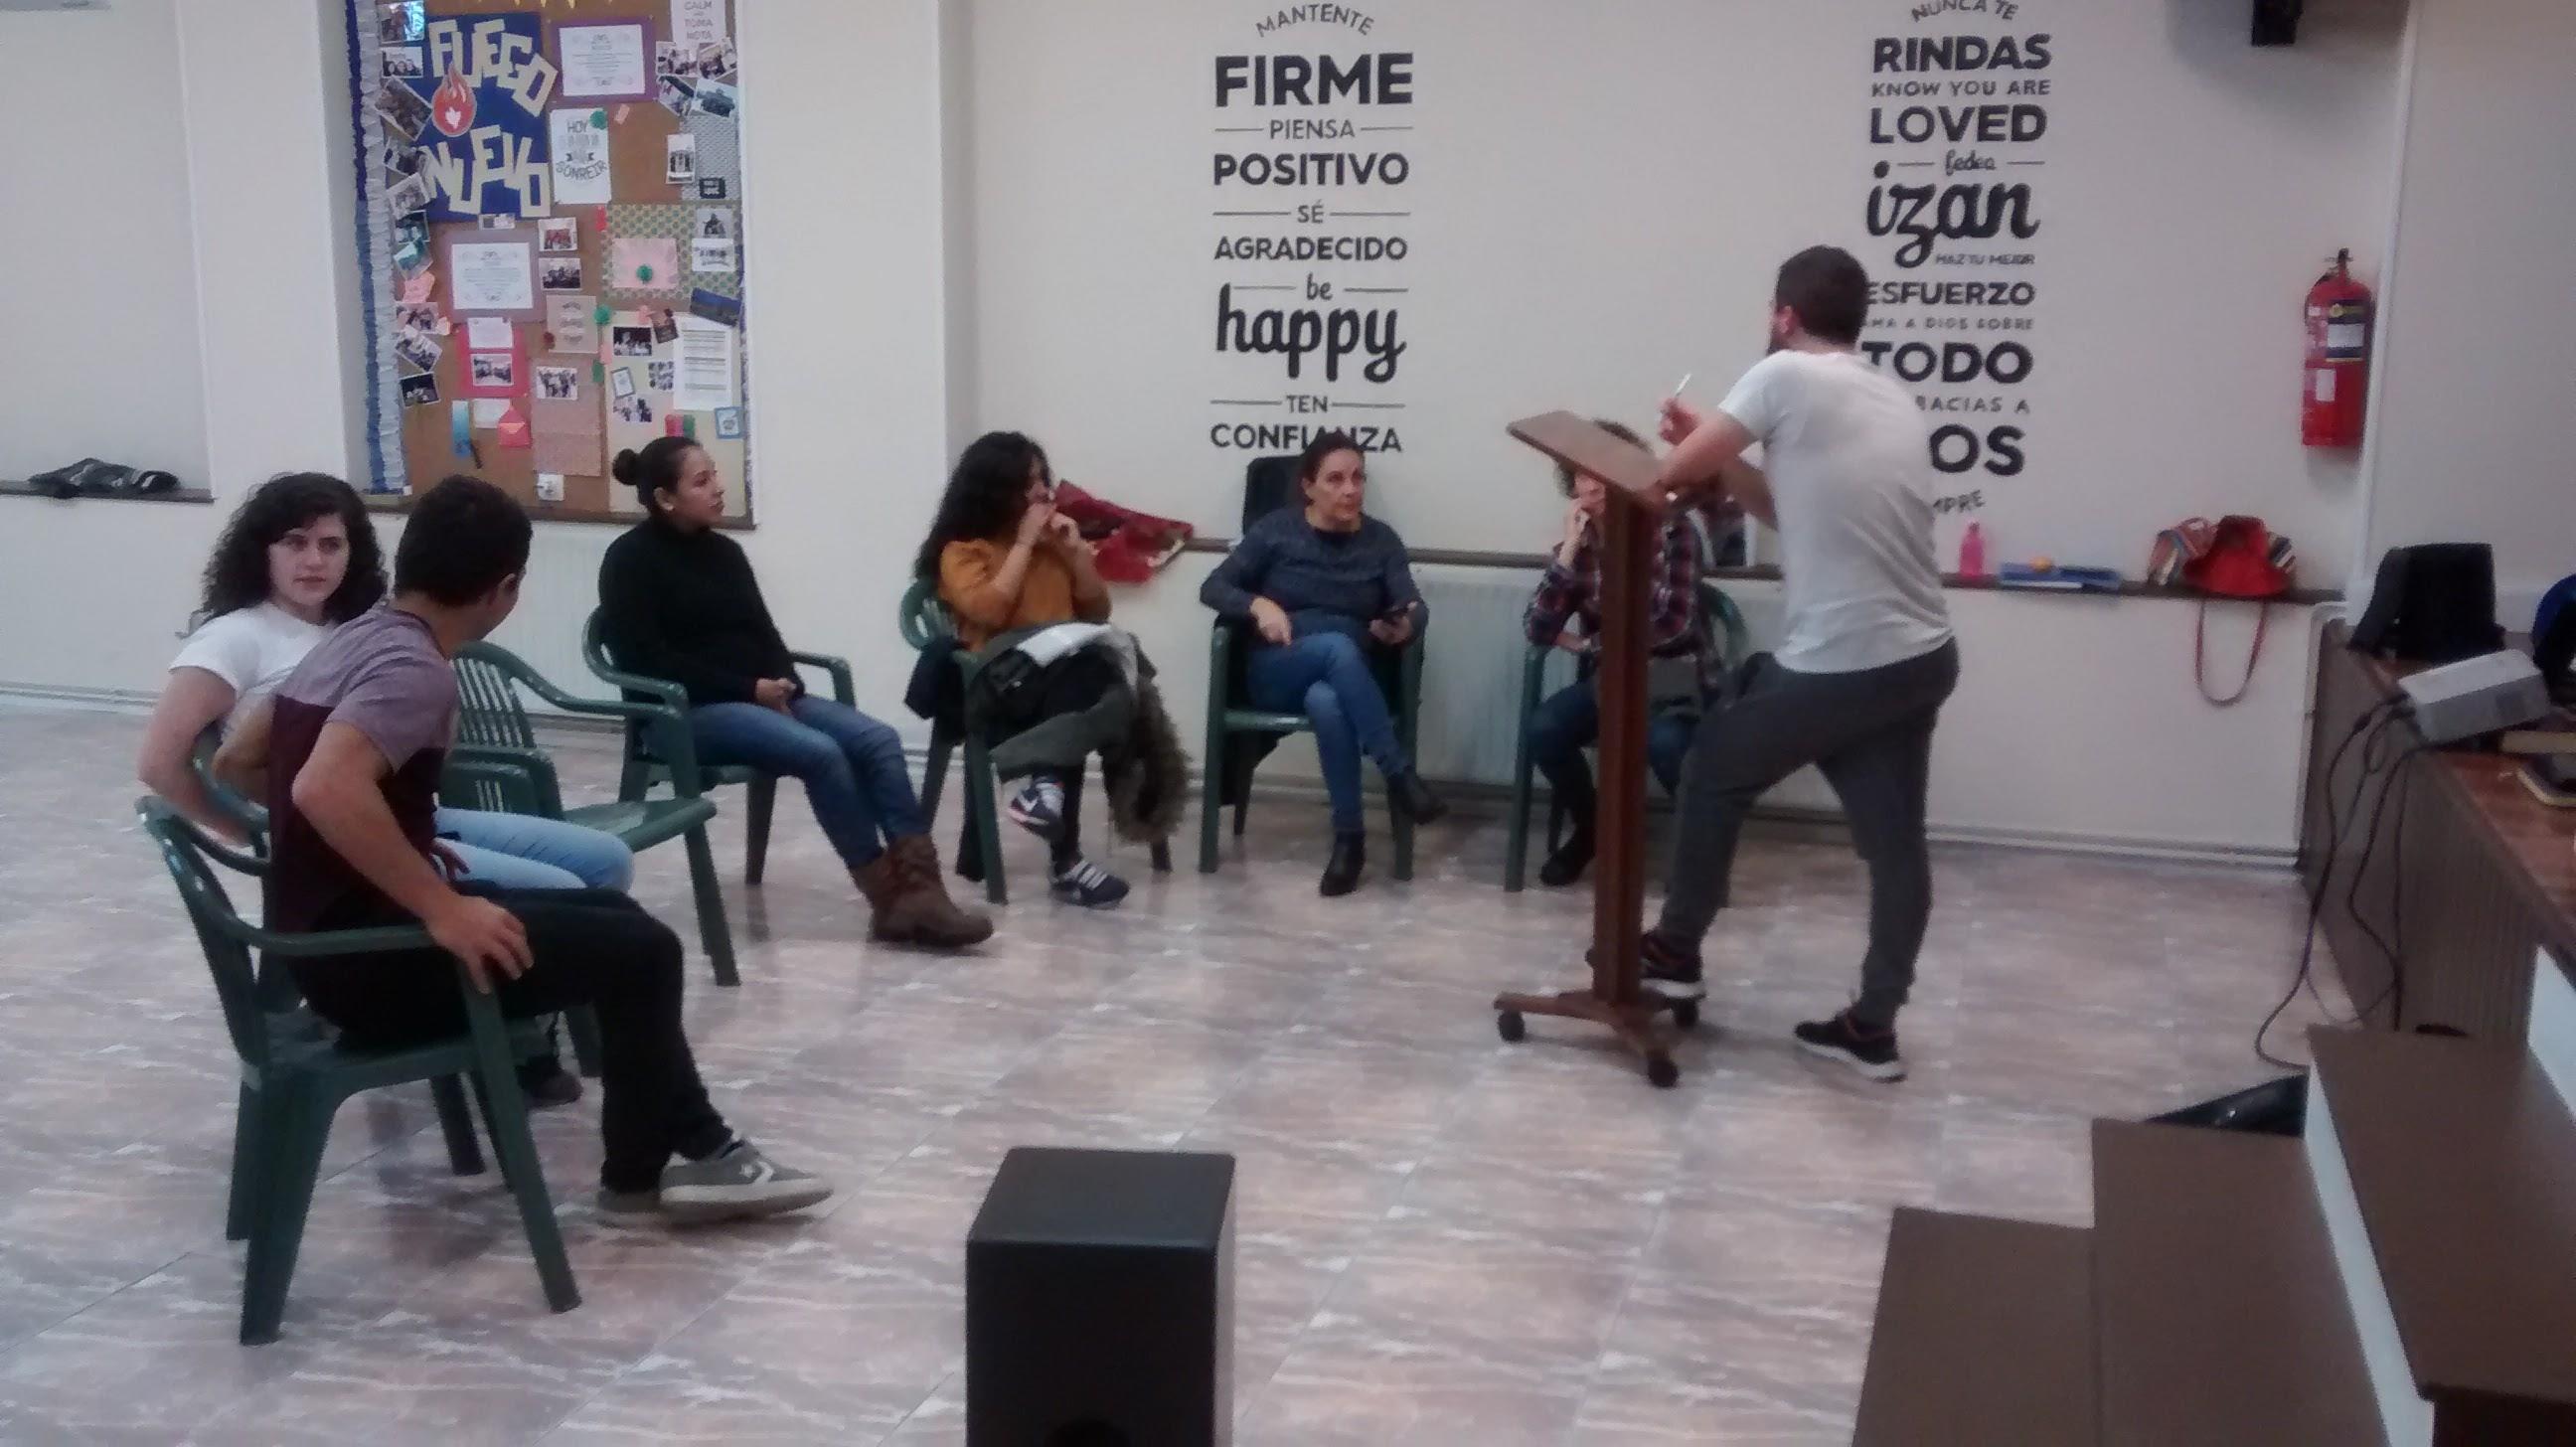 2016.10.22 y 23 - Retiro Ministerio de Música (10).jpg